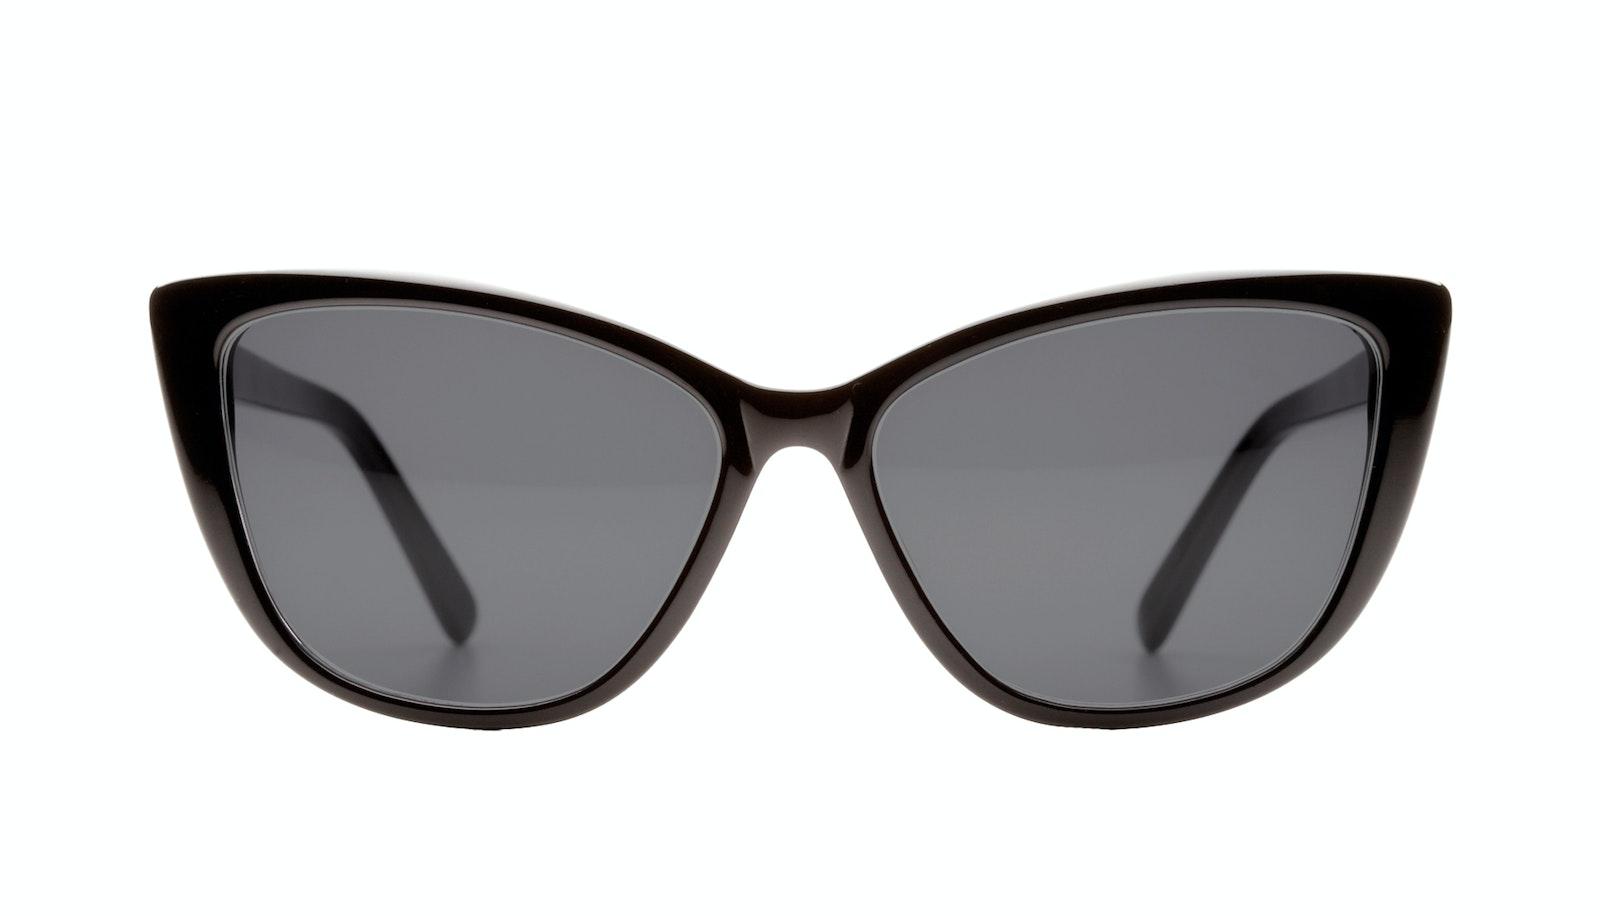 Affordable Fashion Glasses Cat Eye Daring Cateye Sunglasses Women Dolled Up Black